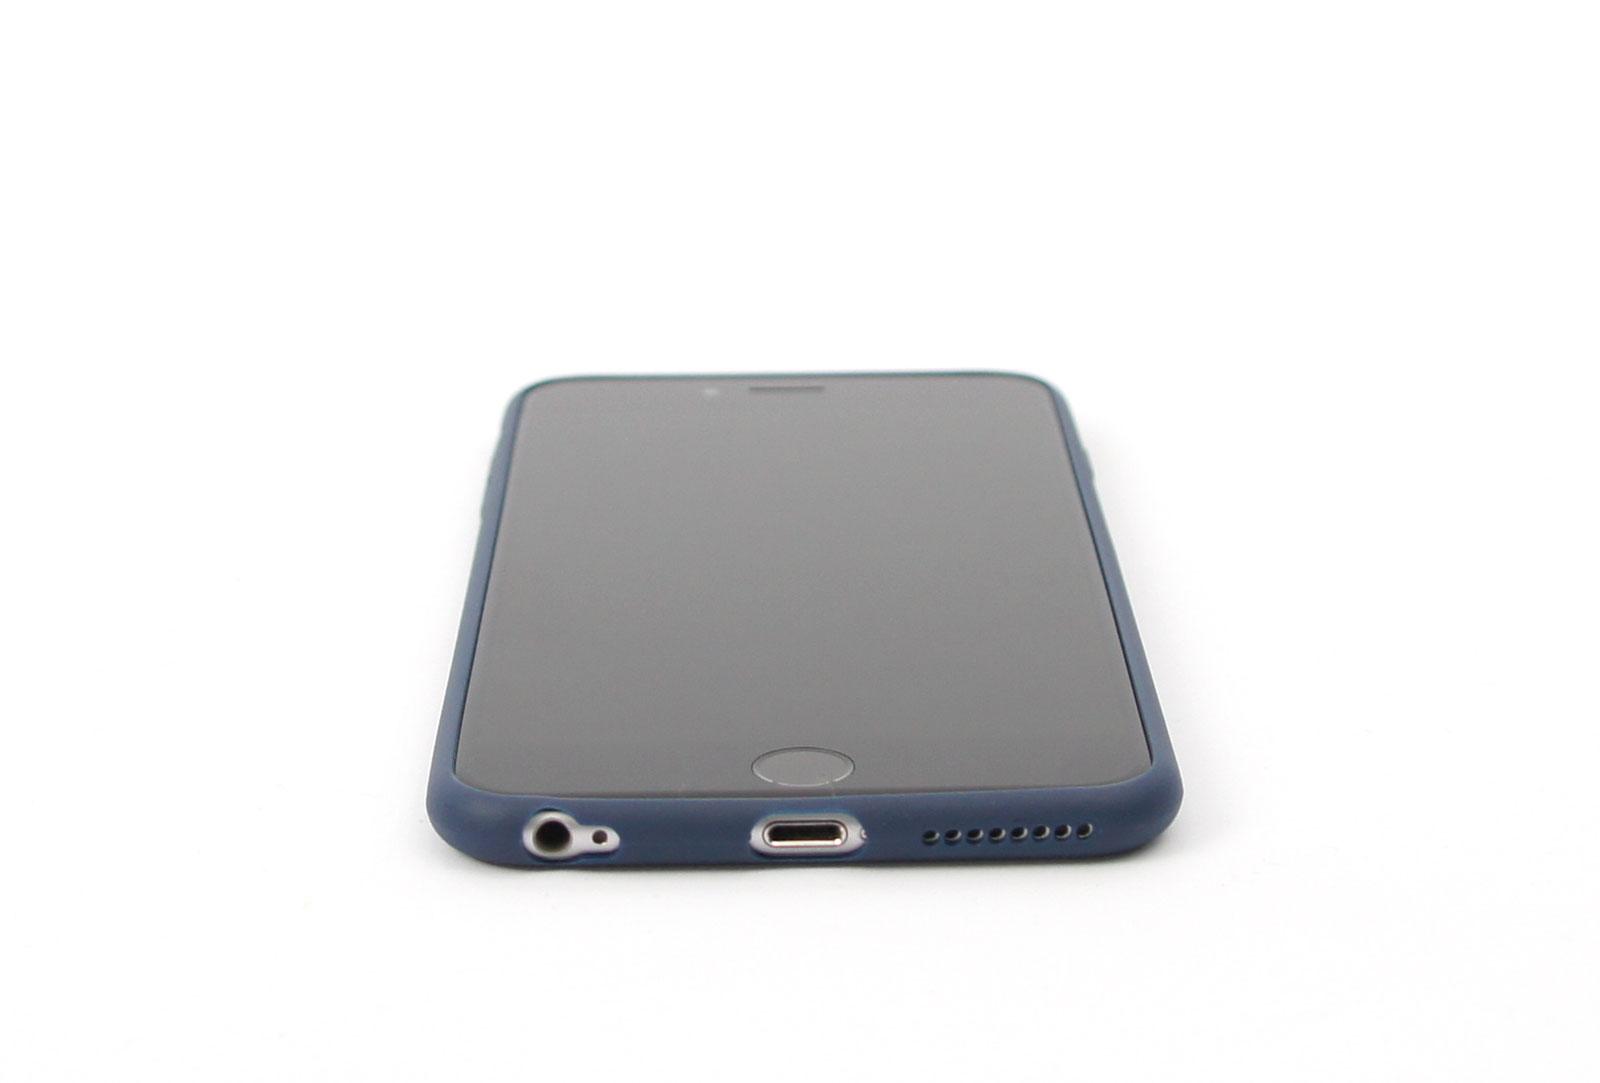 Coque Souple Iphone S Plus